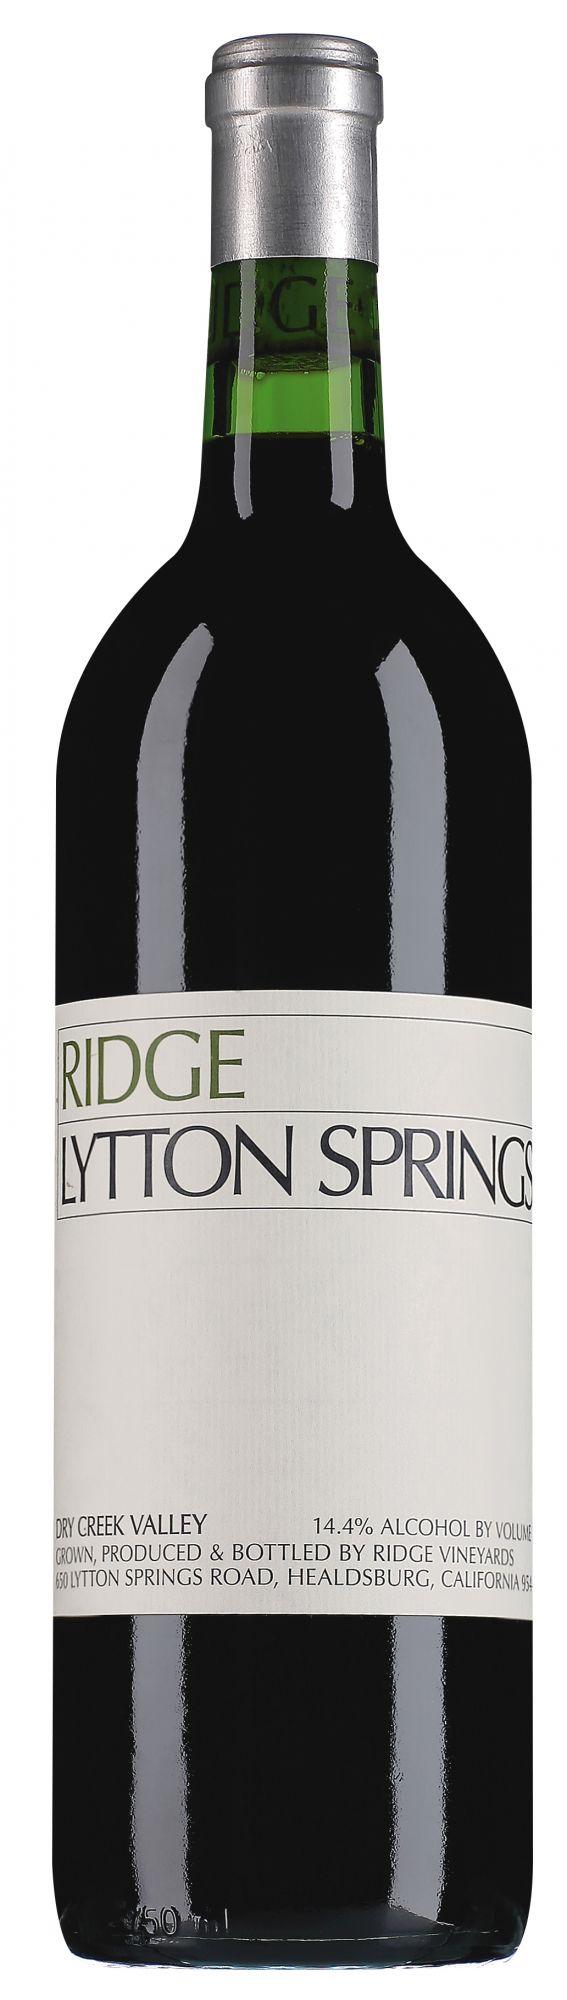 Ridge Dry Creek Valley Lytton Springs Zinfandel